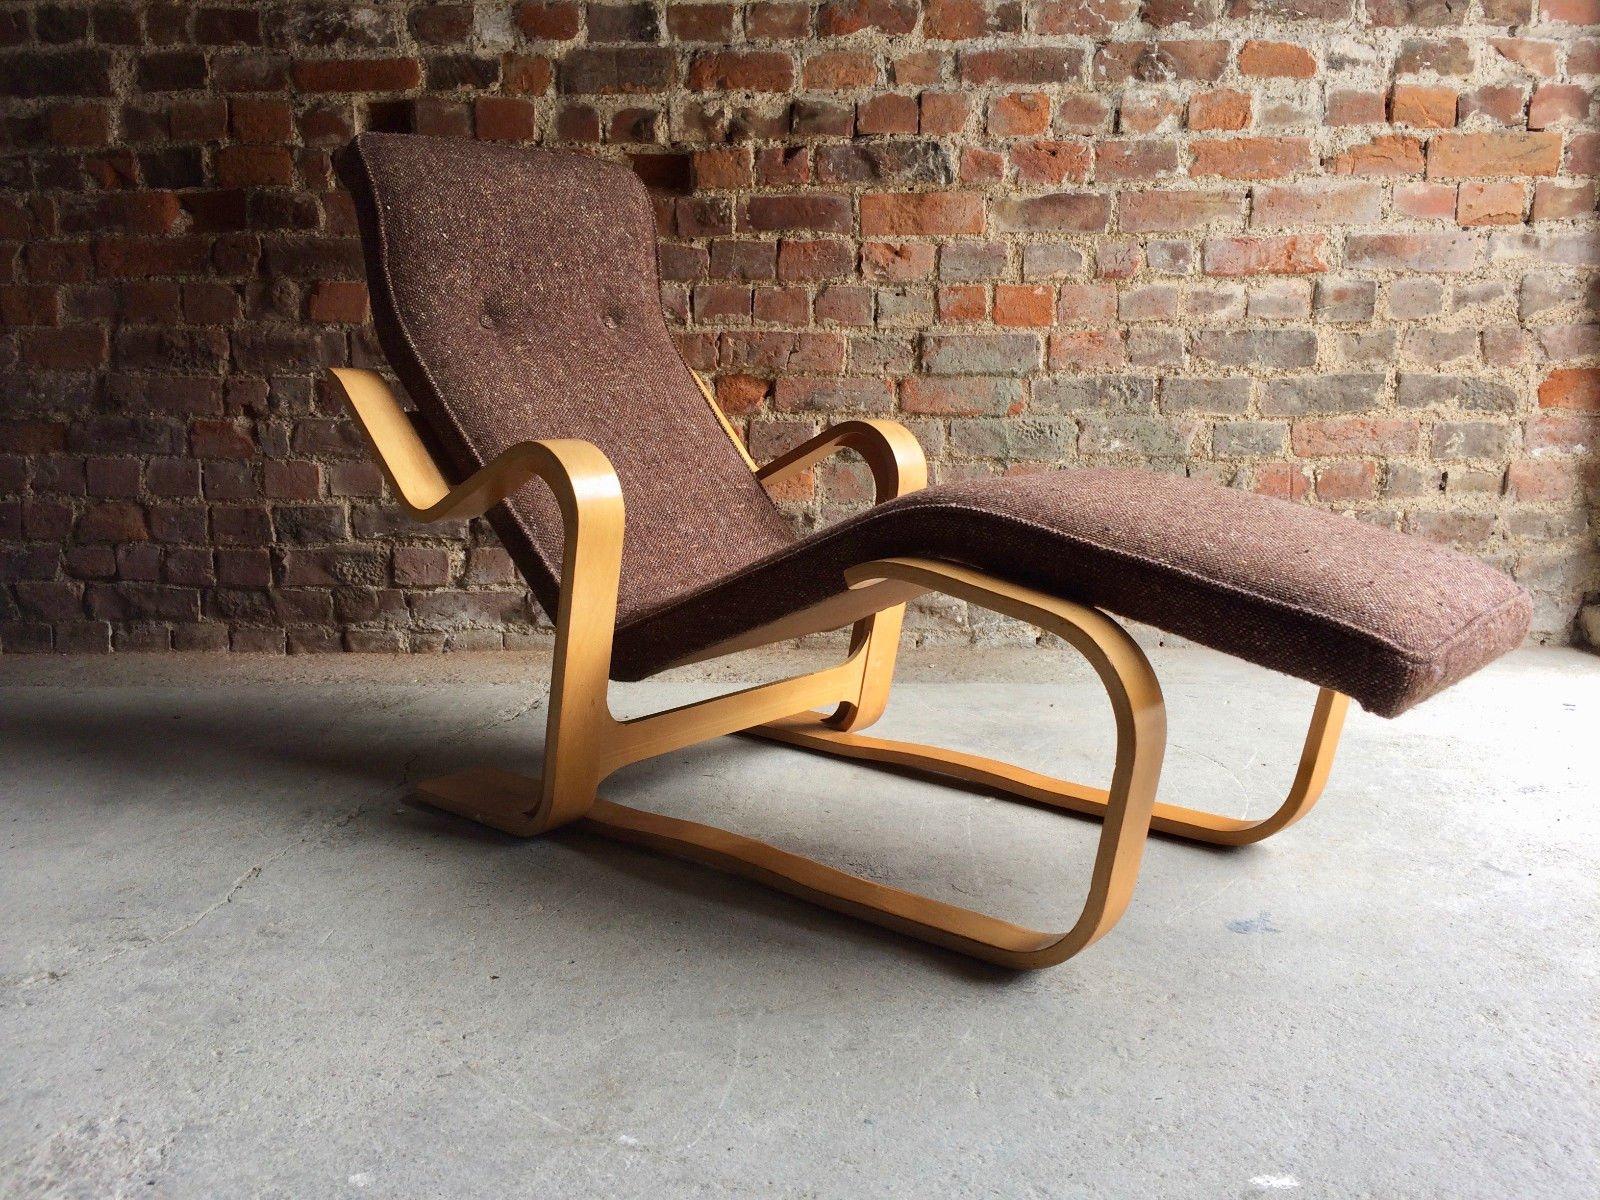 marcel breuer chair bauhaus bauhaus furniture on. Black Bedroom Furniture Sets. Home Design Ideas